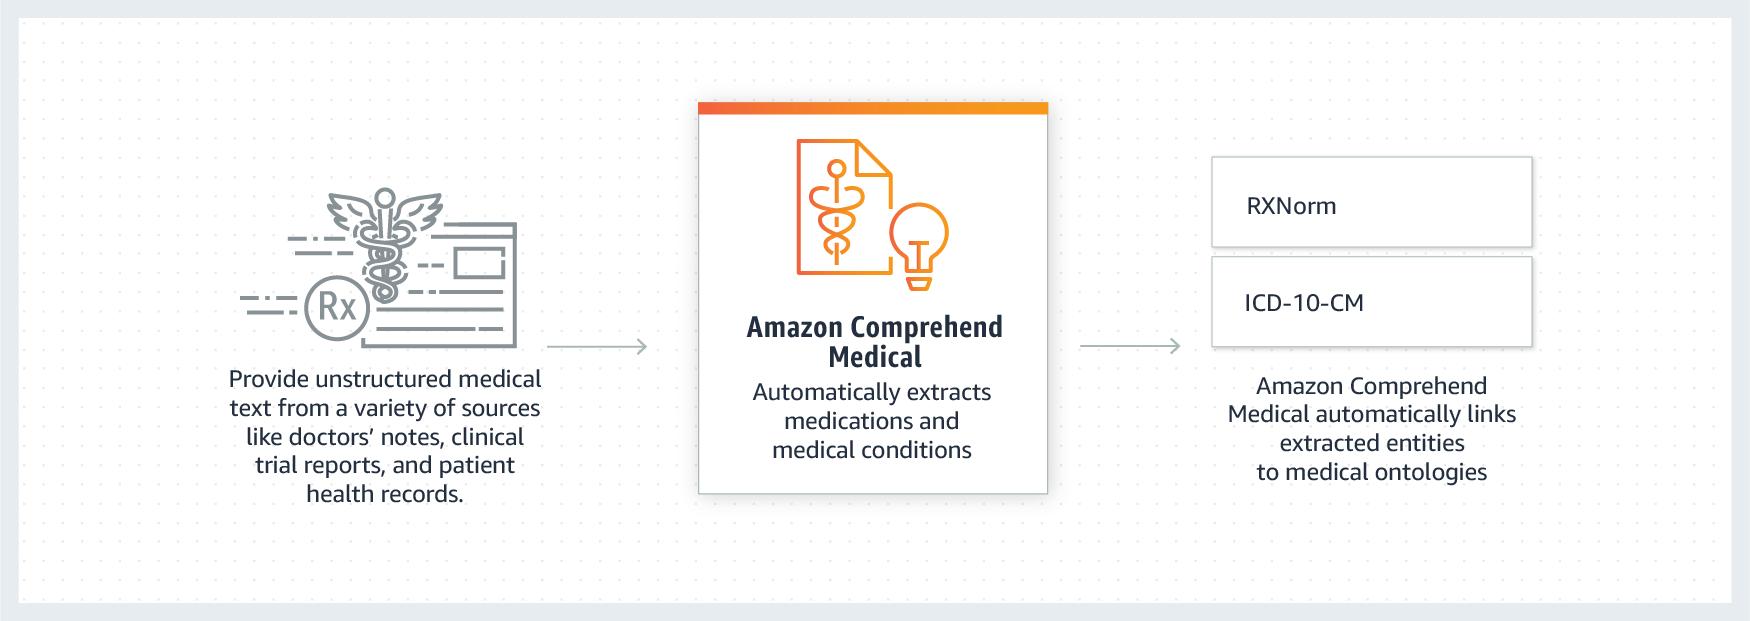 Amazon Comprehend Medical workflow